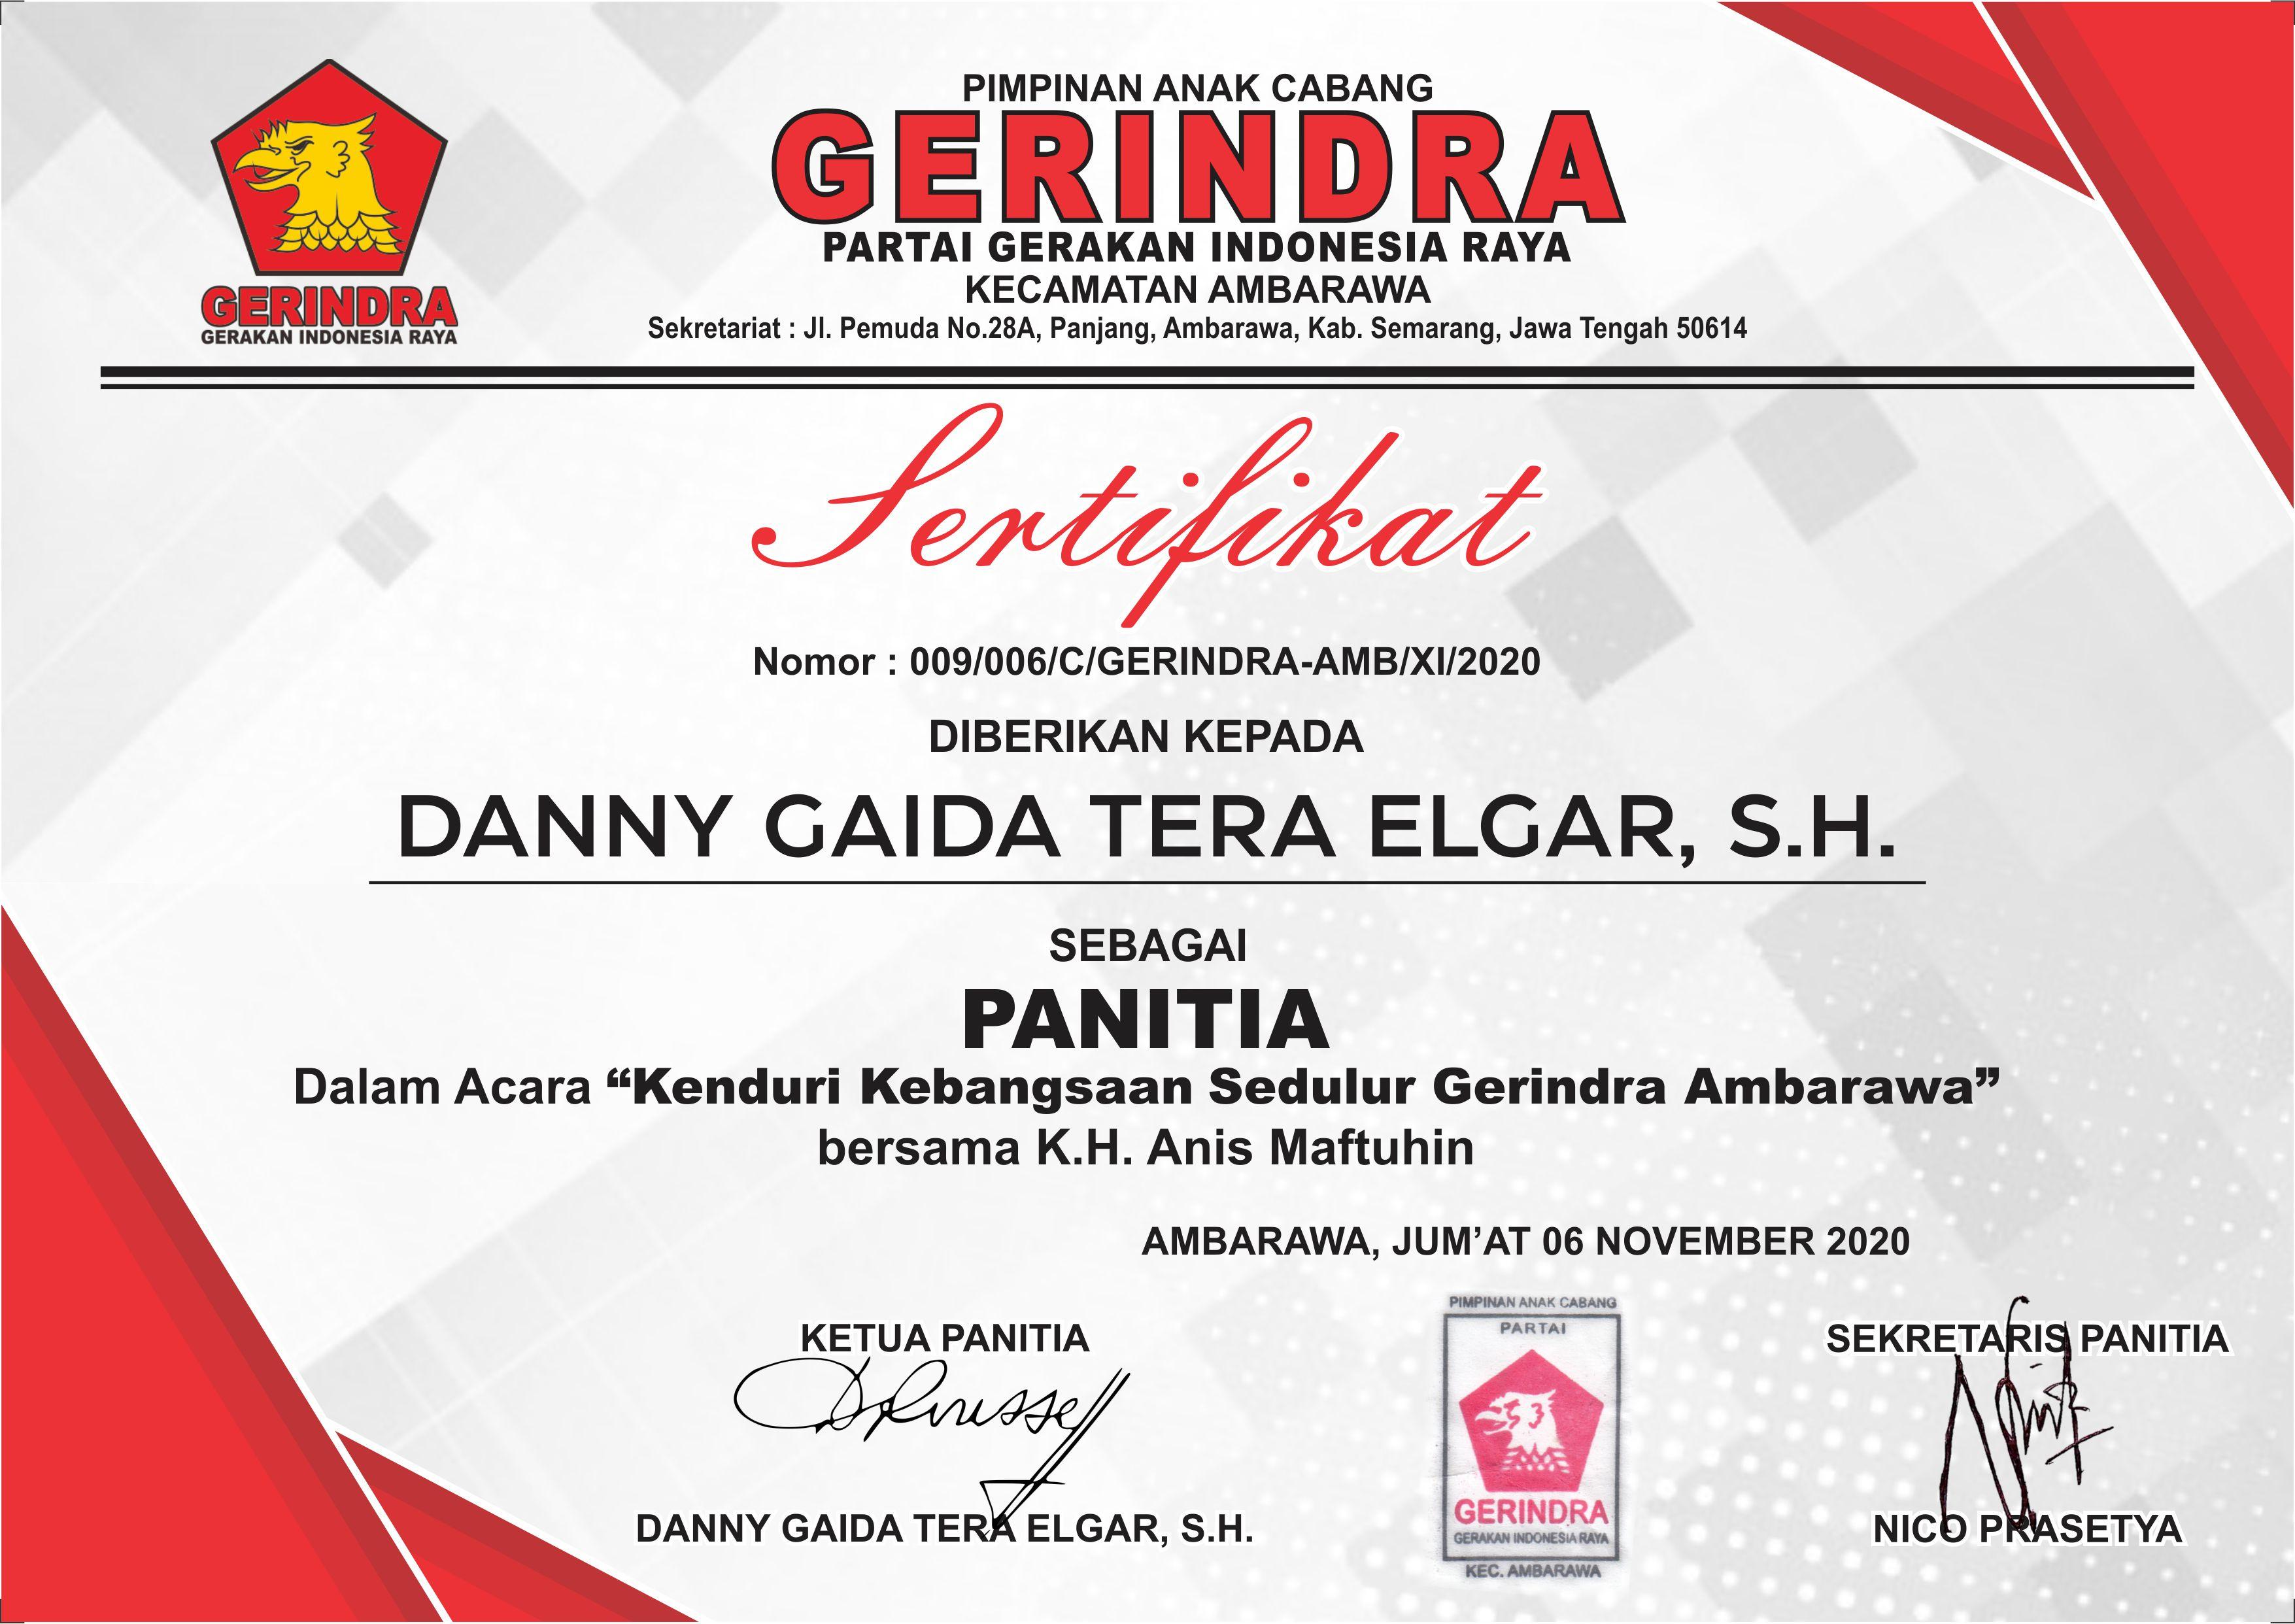 Pimpinan Anak Cabang (PAC) Partai Gerakan Indonesia Raya (Gerindra) Kecamatan Ambarawa, Kabupaten Semarang, Jawa Tengah